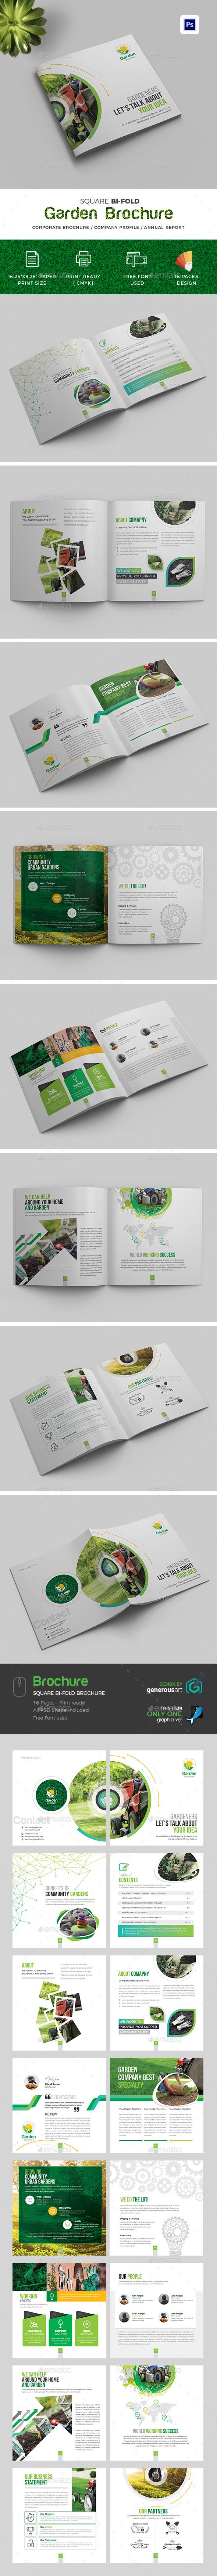 Garden Square Bi-Fold Brochure - Brochures Print Templates